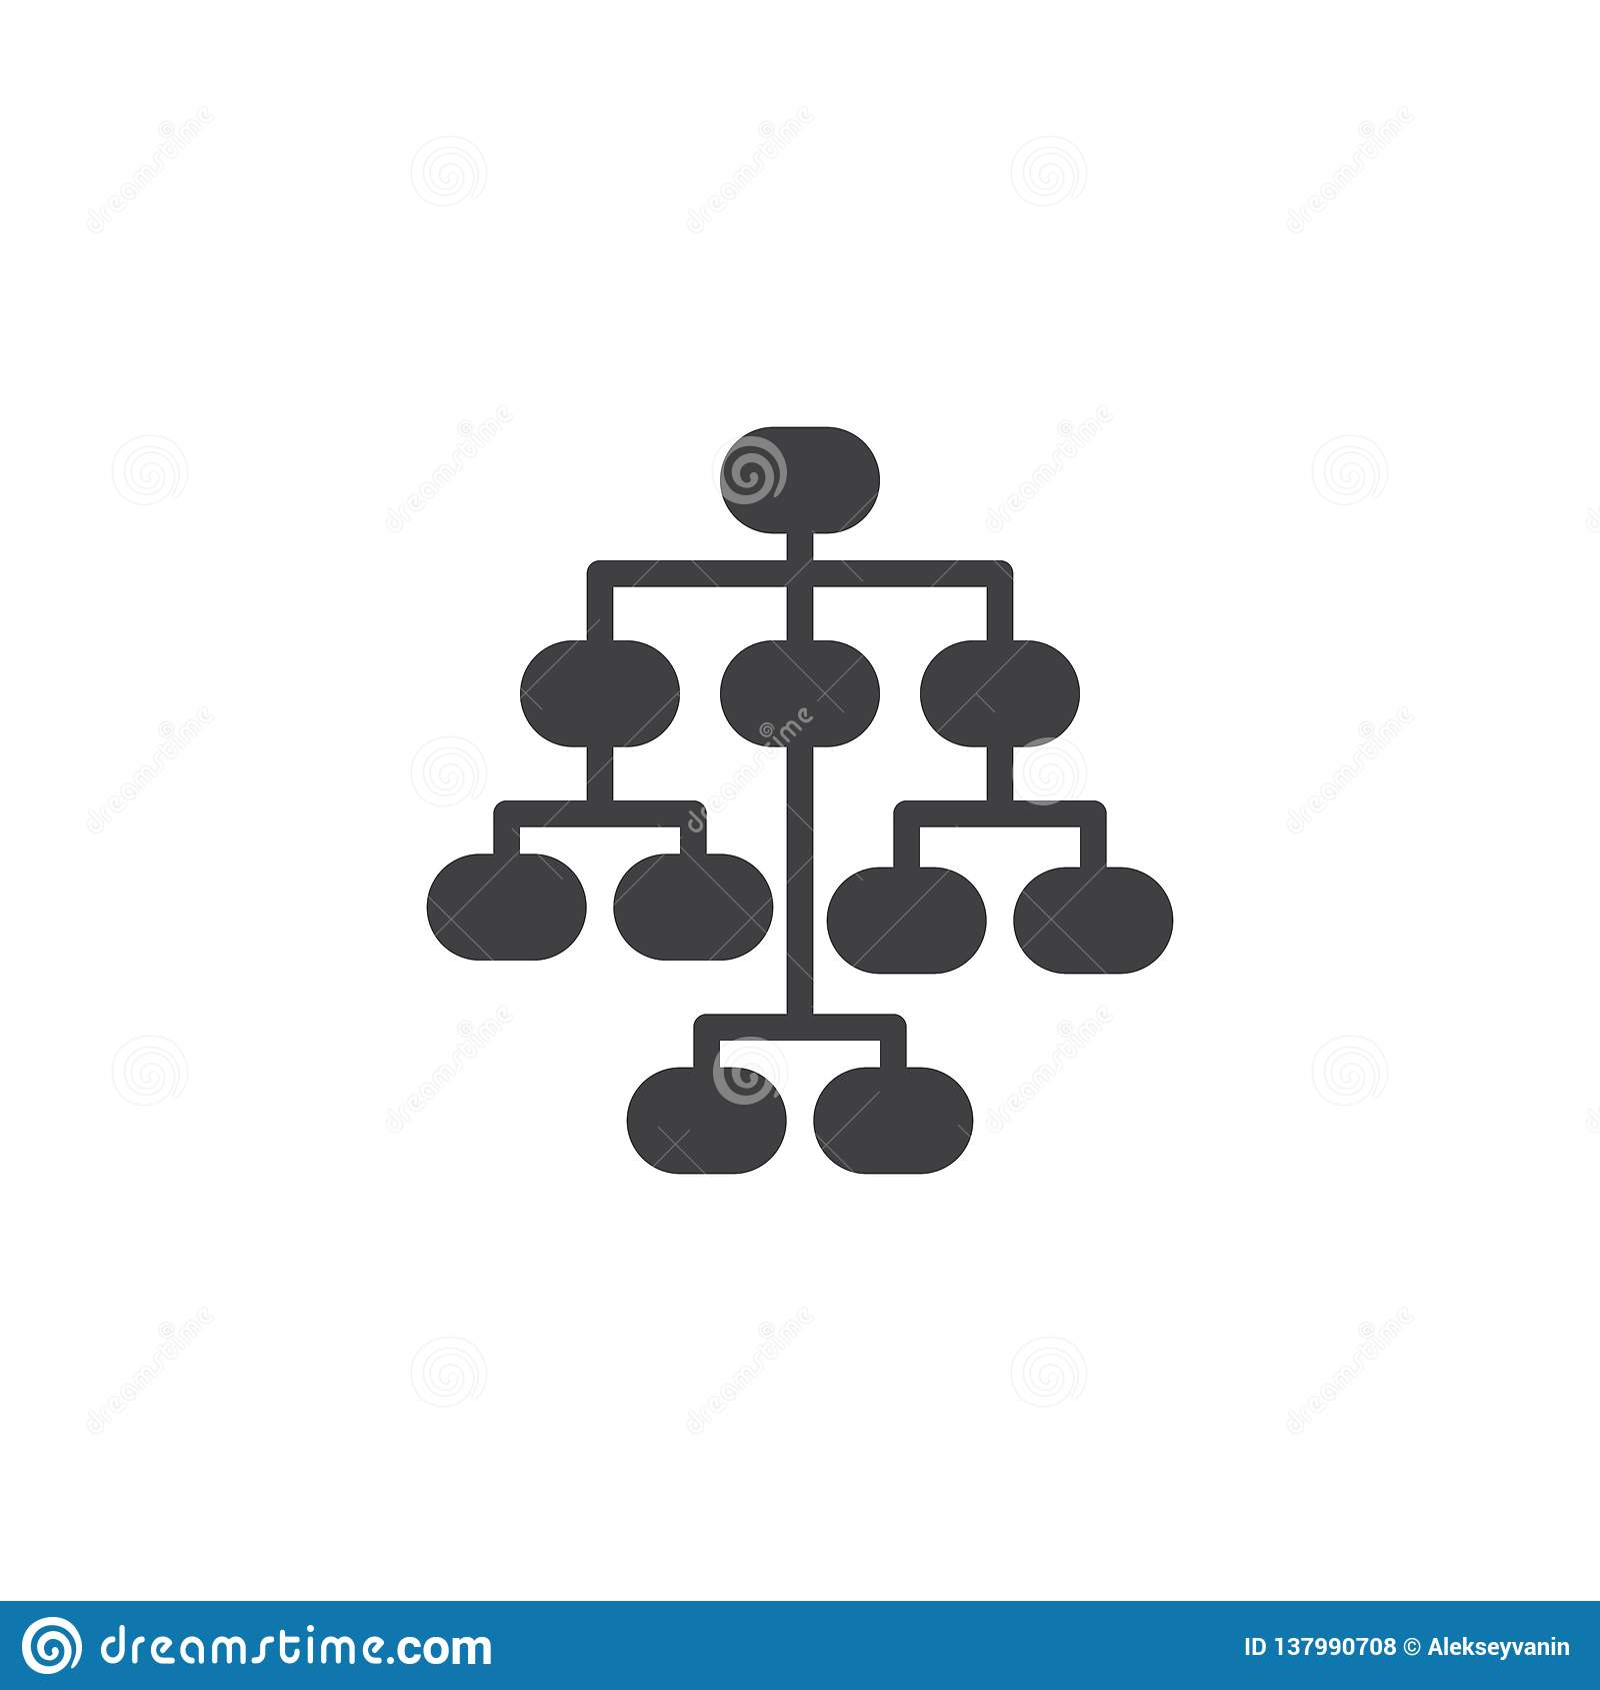 Sitemap vector icon